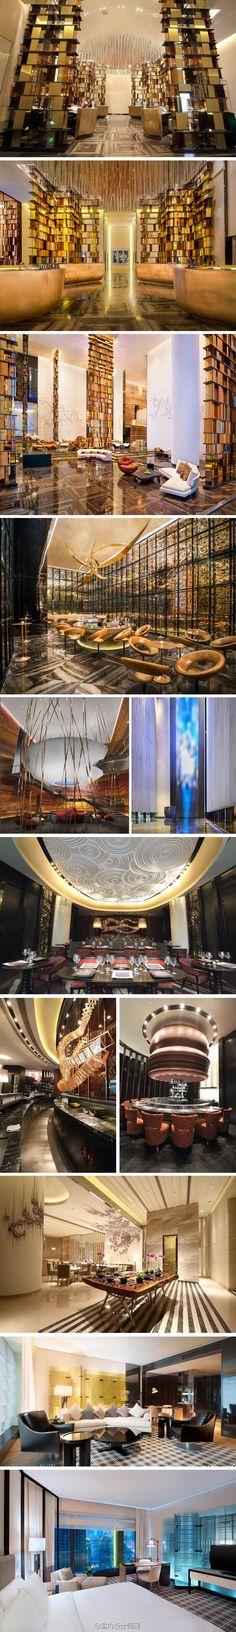 W hotel in Guangzhou